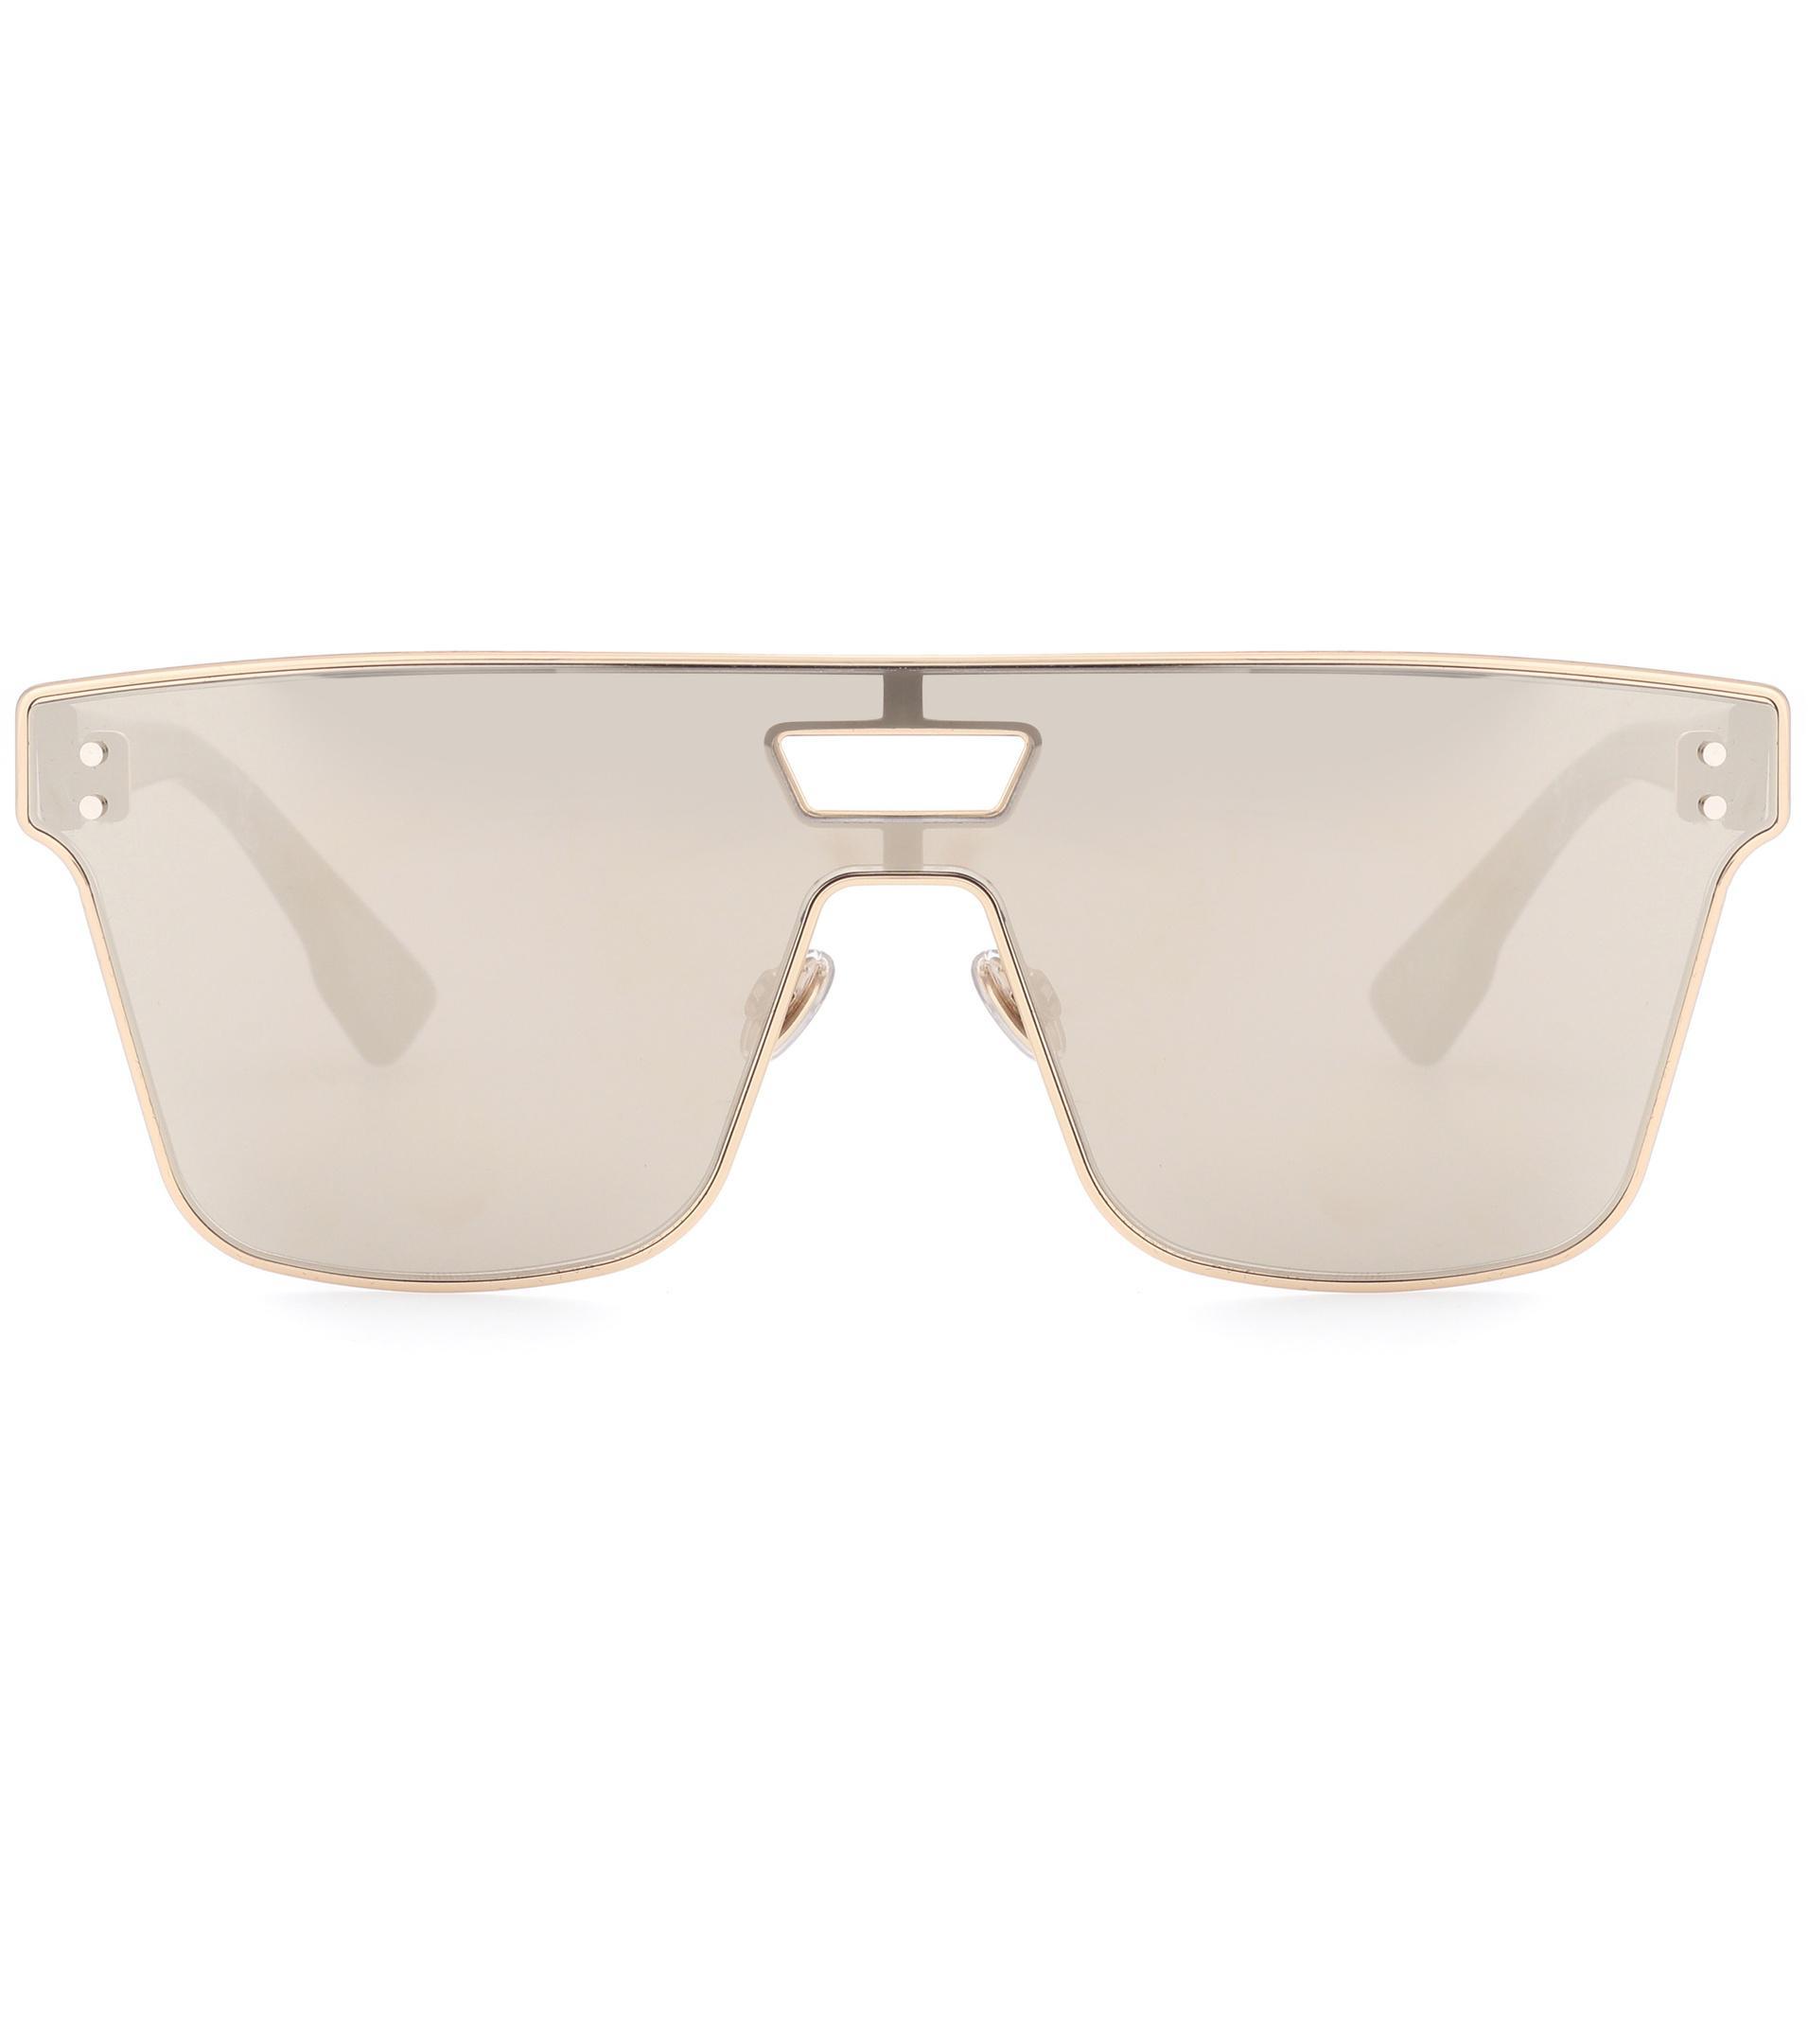 Womens Diorizon1 Sunglasses Dior RLx103c